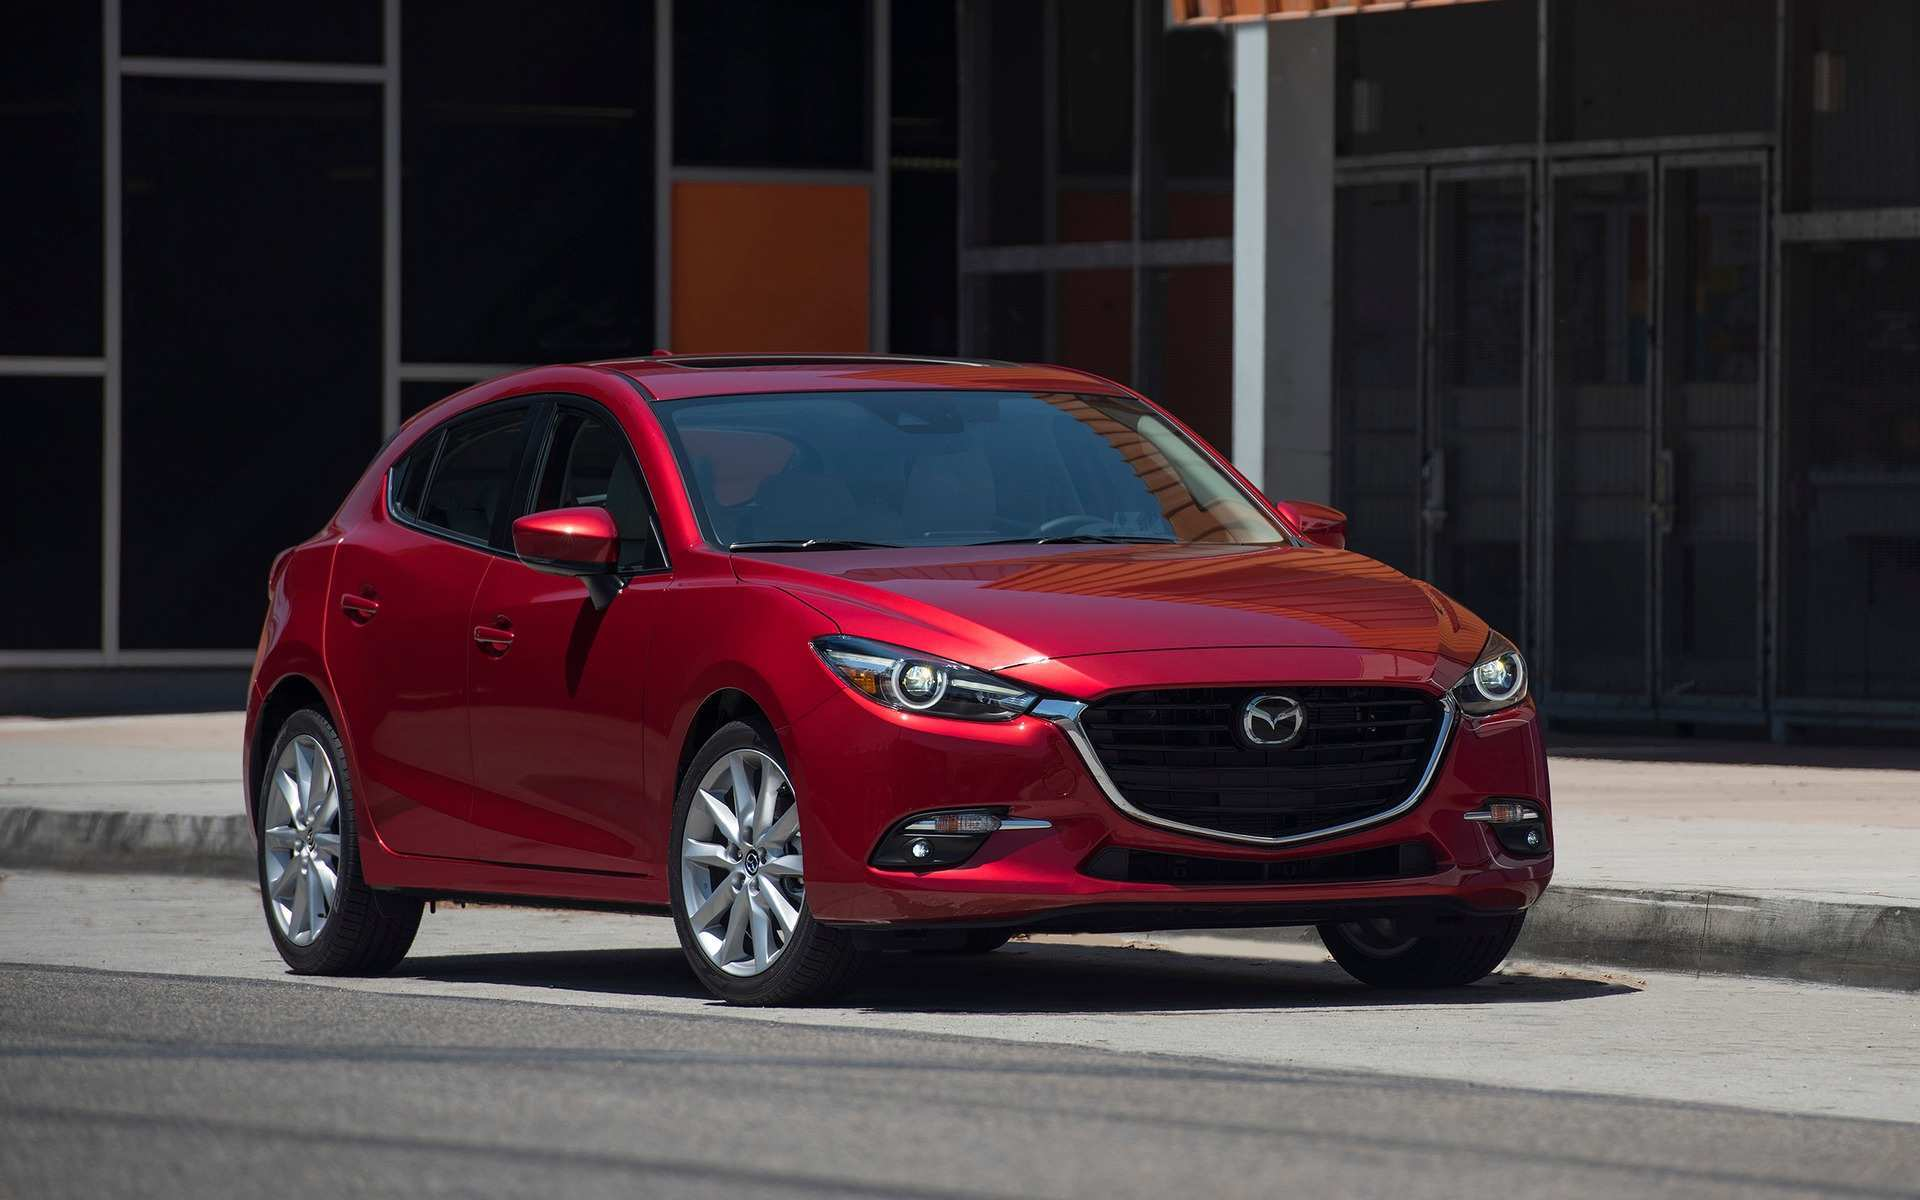 80 Concept of Mazda 2020 Apple Carplay New Review for Mazda 2020 Apple Carplay